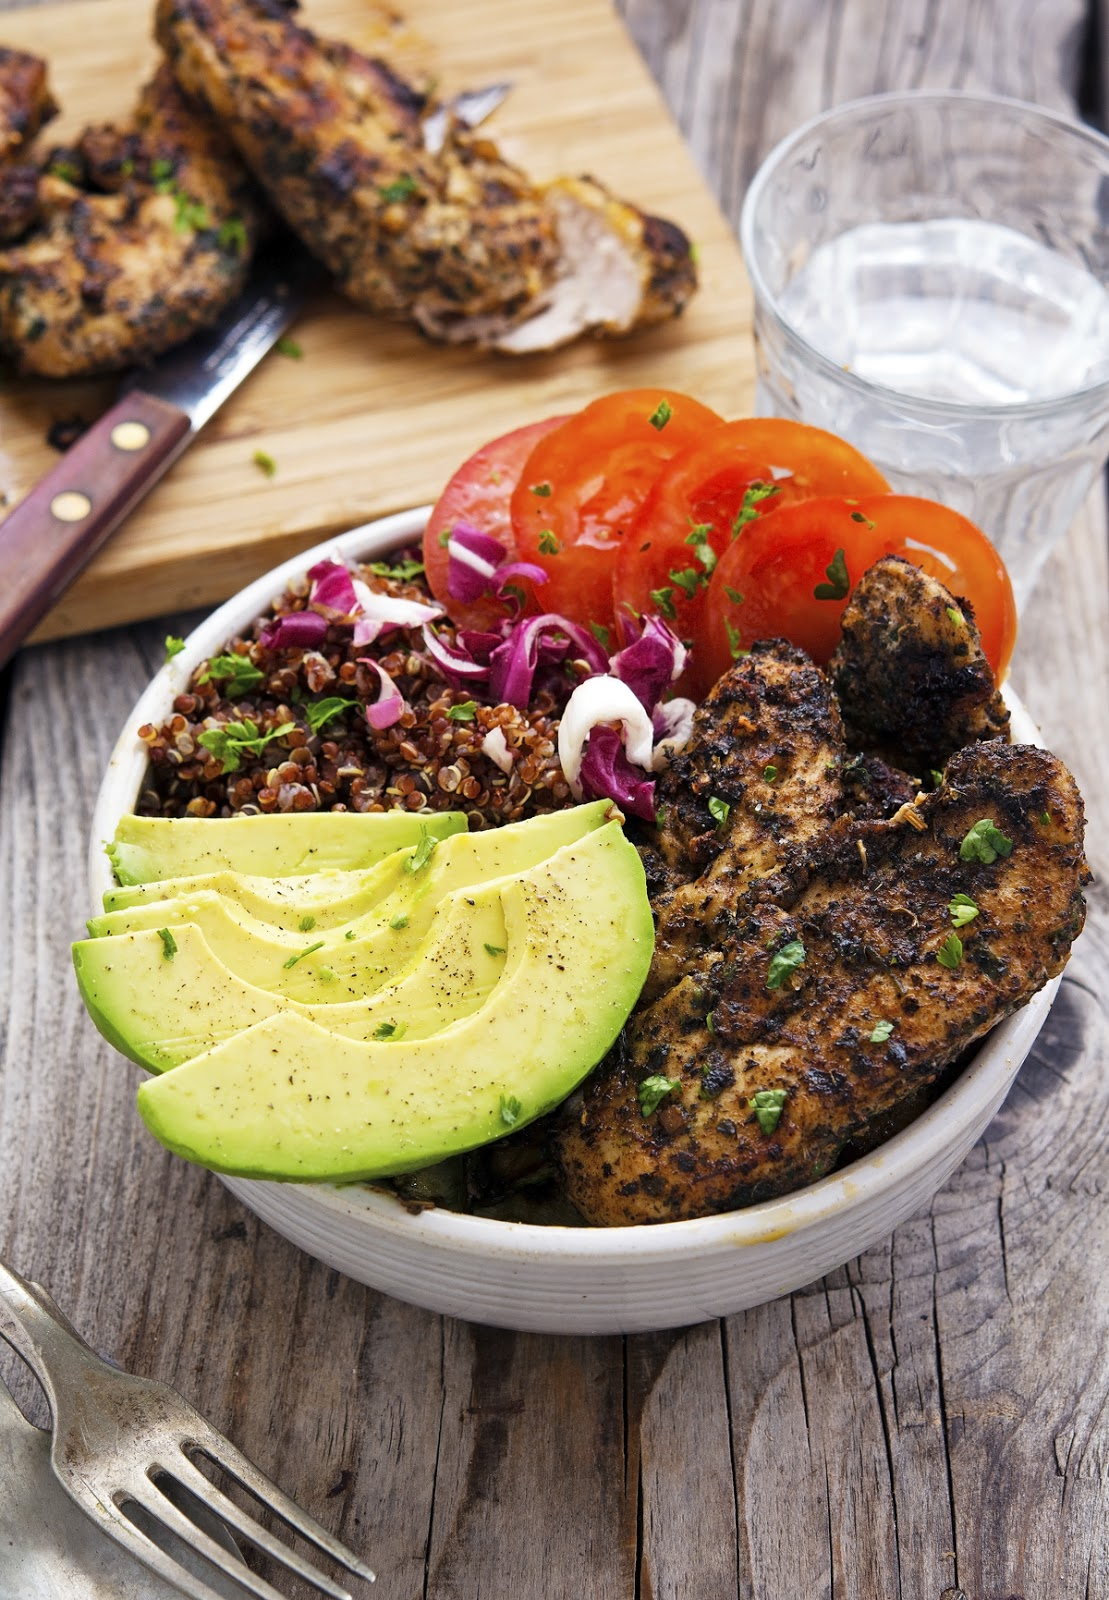 California Chicken Avocado and Red Quinoa Bowls